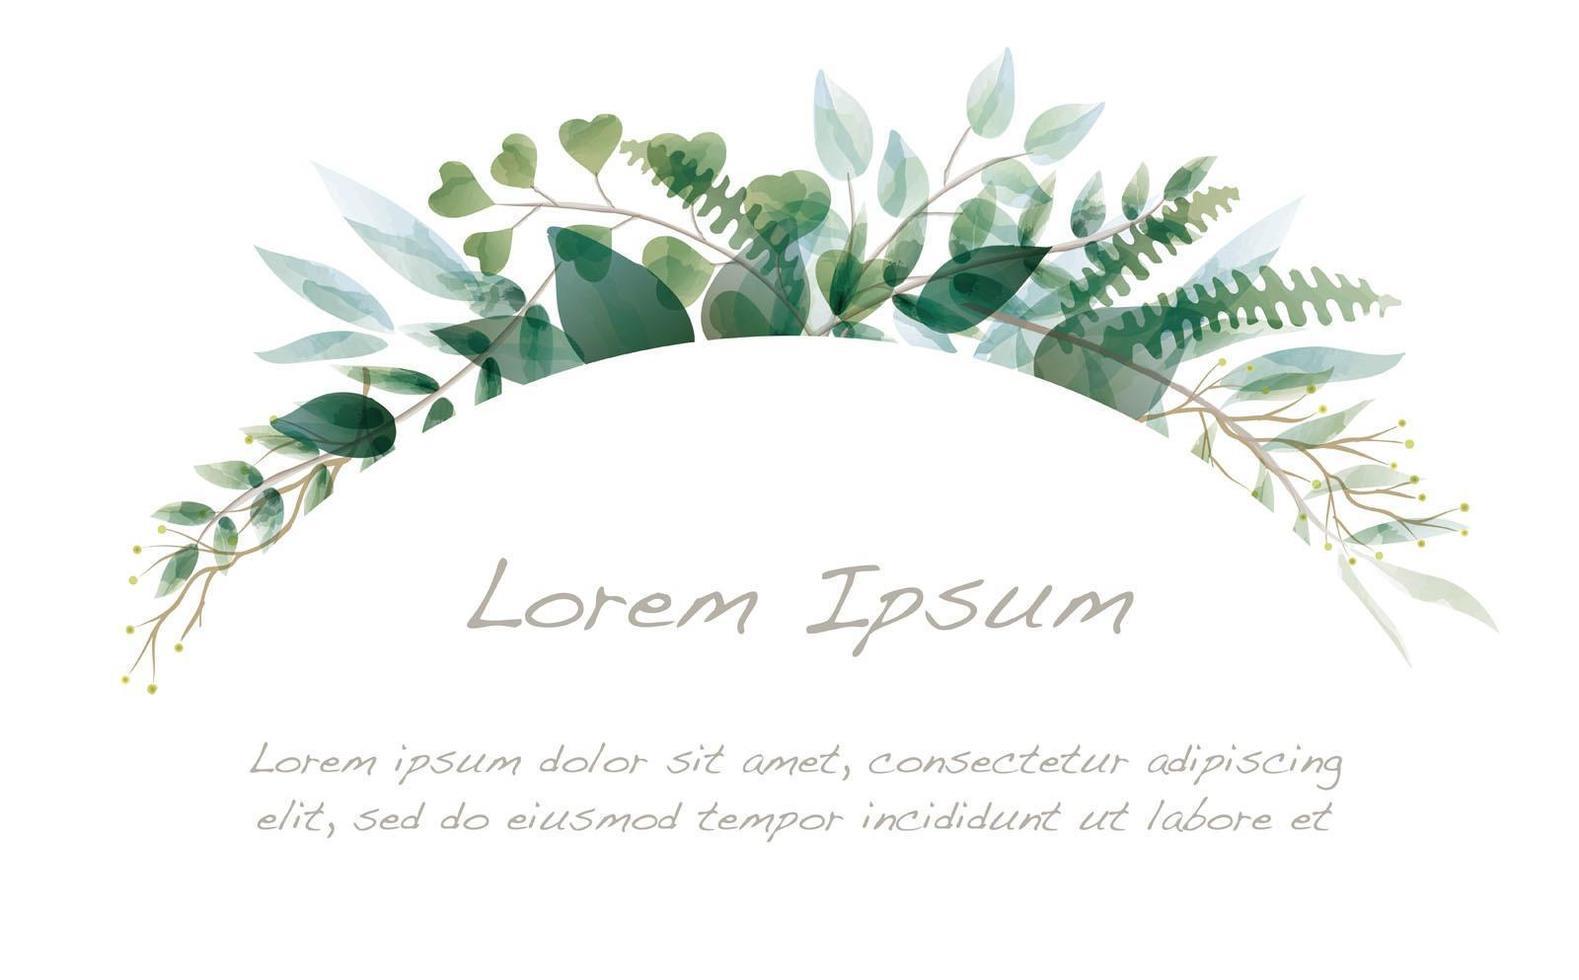 akvarell botaniska båge gränsen vektor